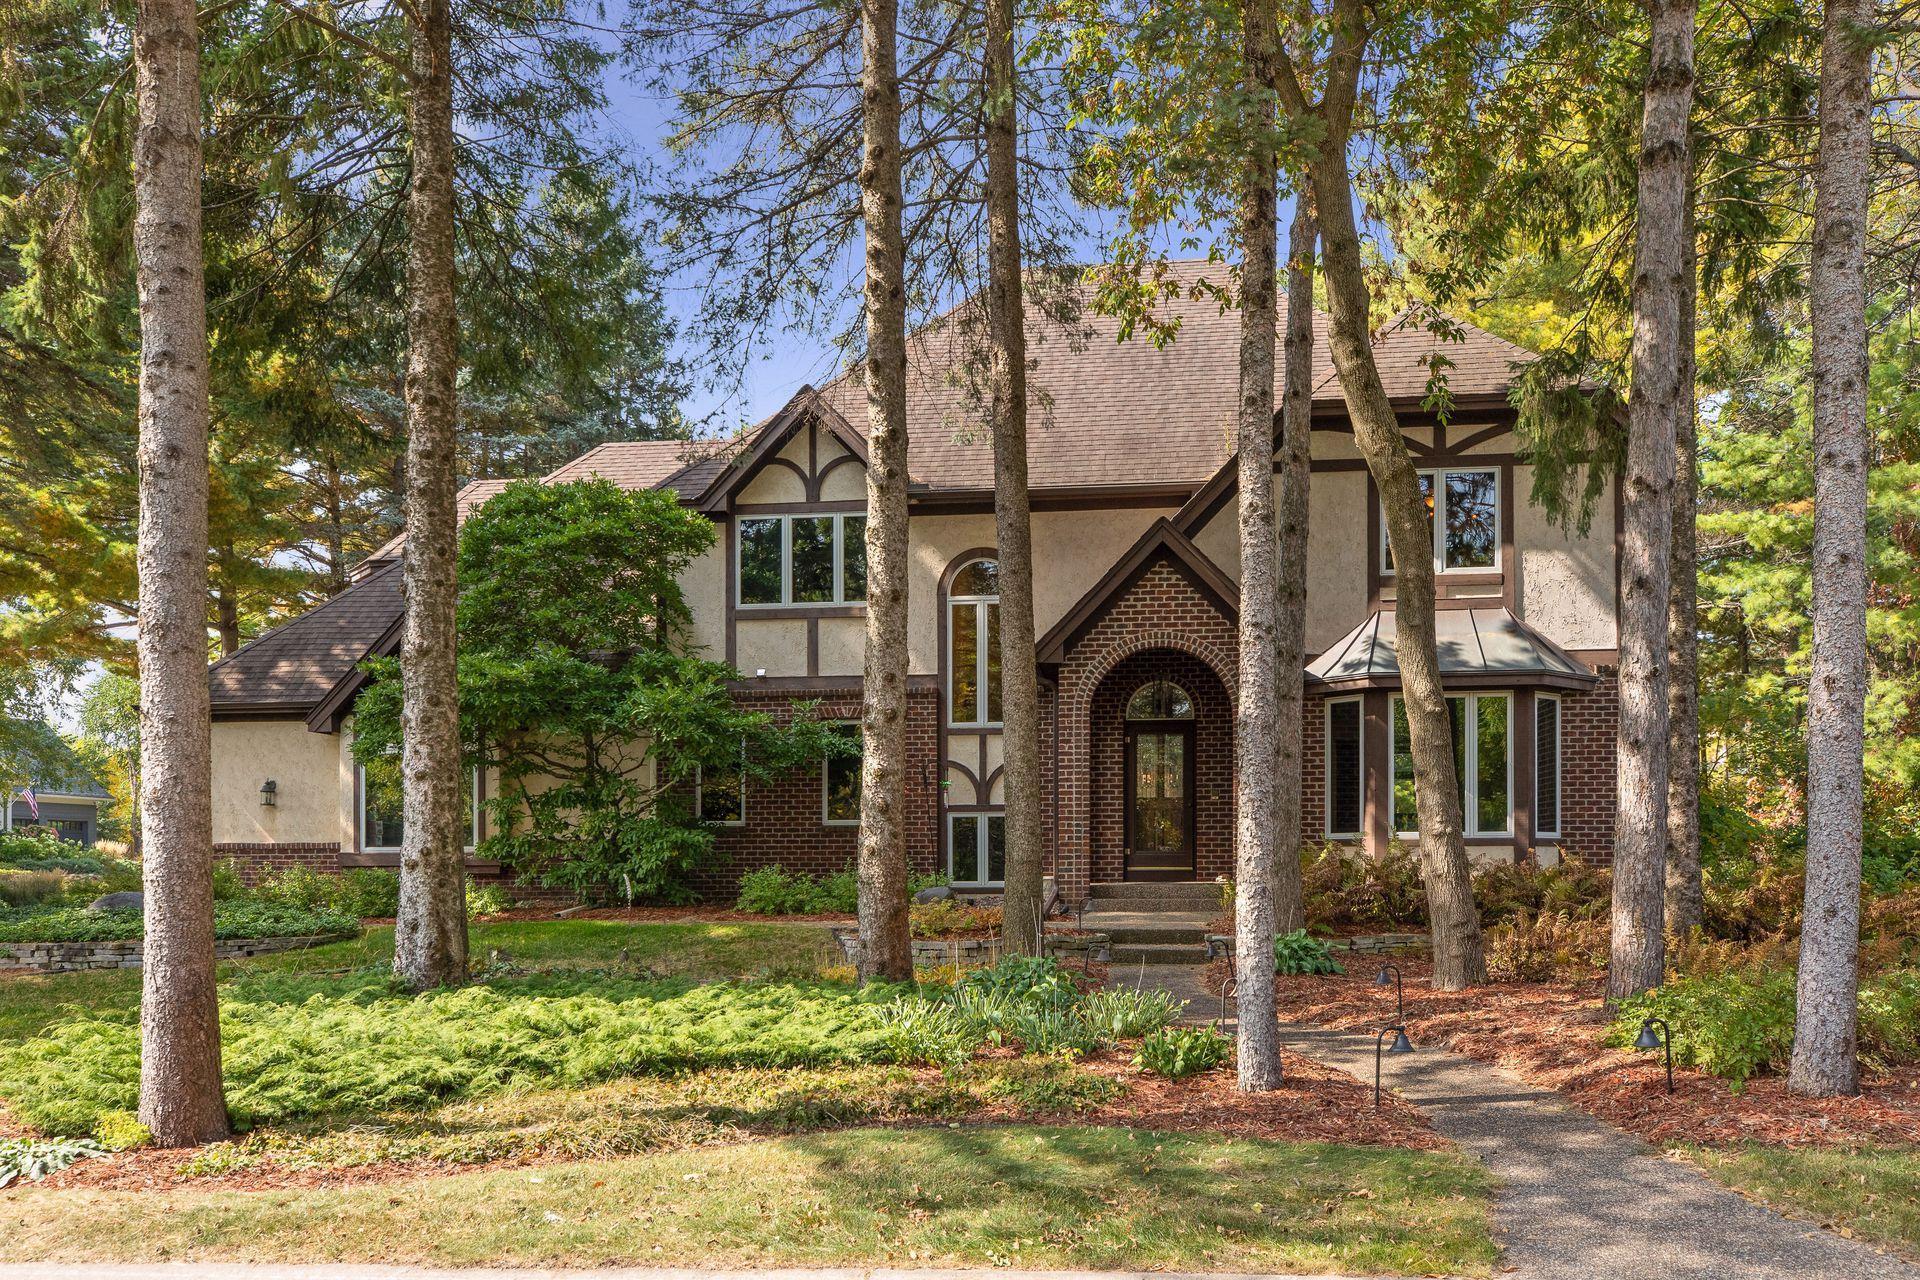 793 Wildridge Court Property Photo - Mahtomedi, MN real estate listing